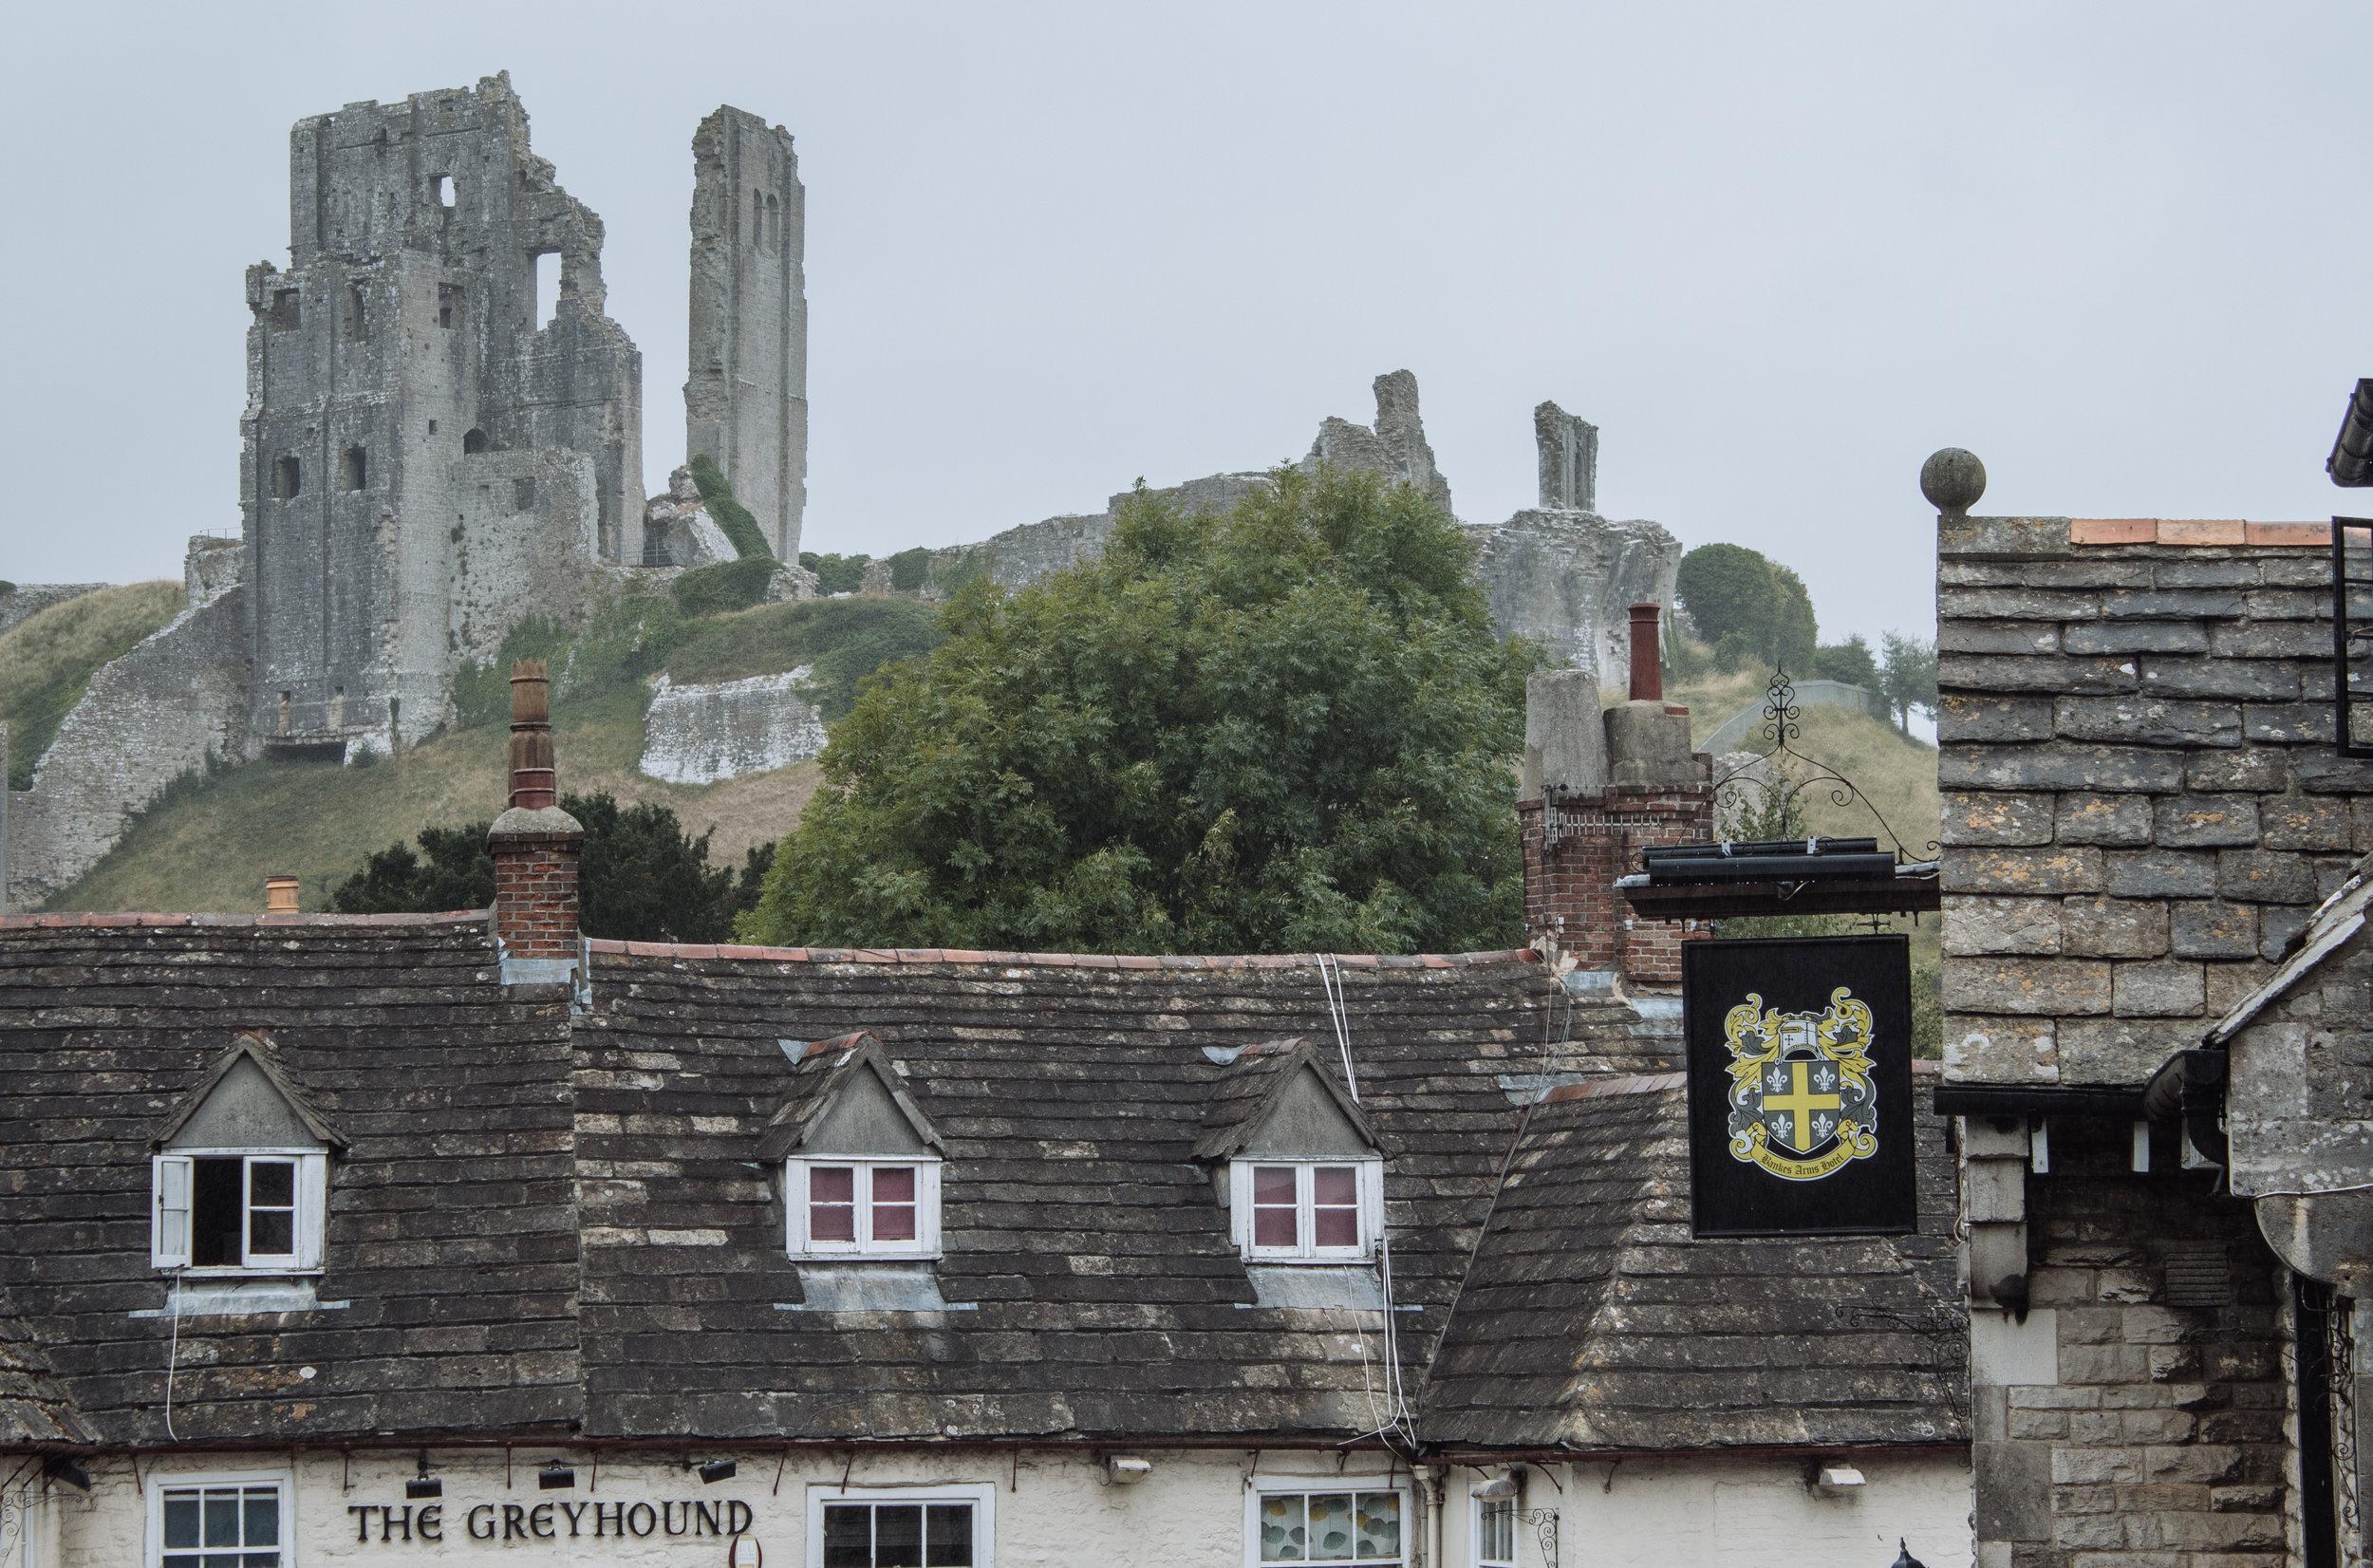 Corfe castle above an english pub